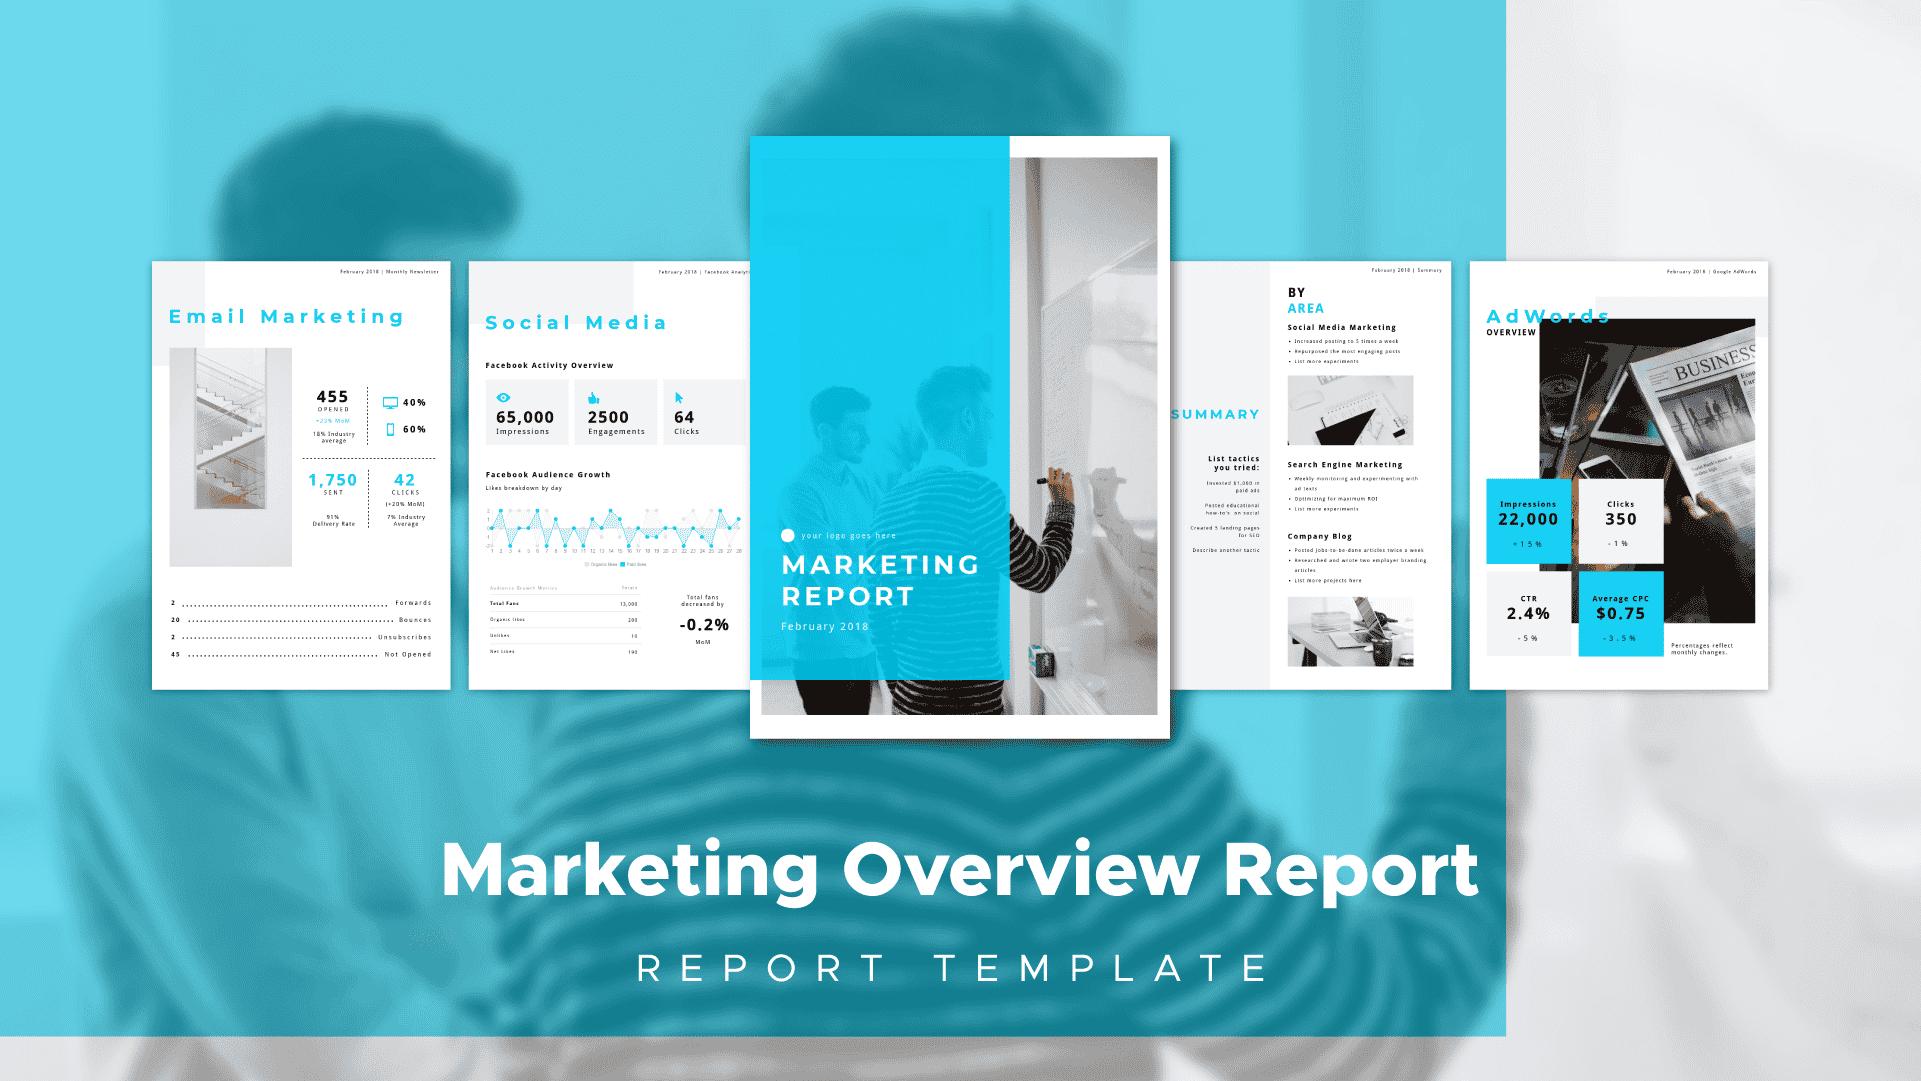 templates-visual_report_1140-1-7133739